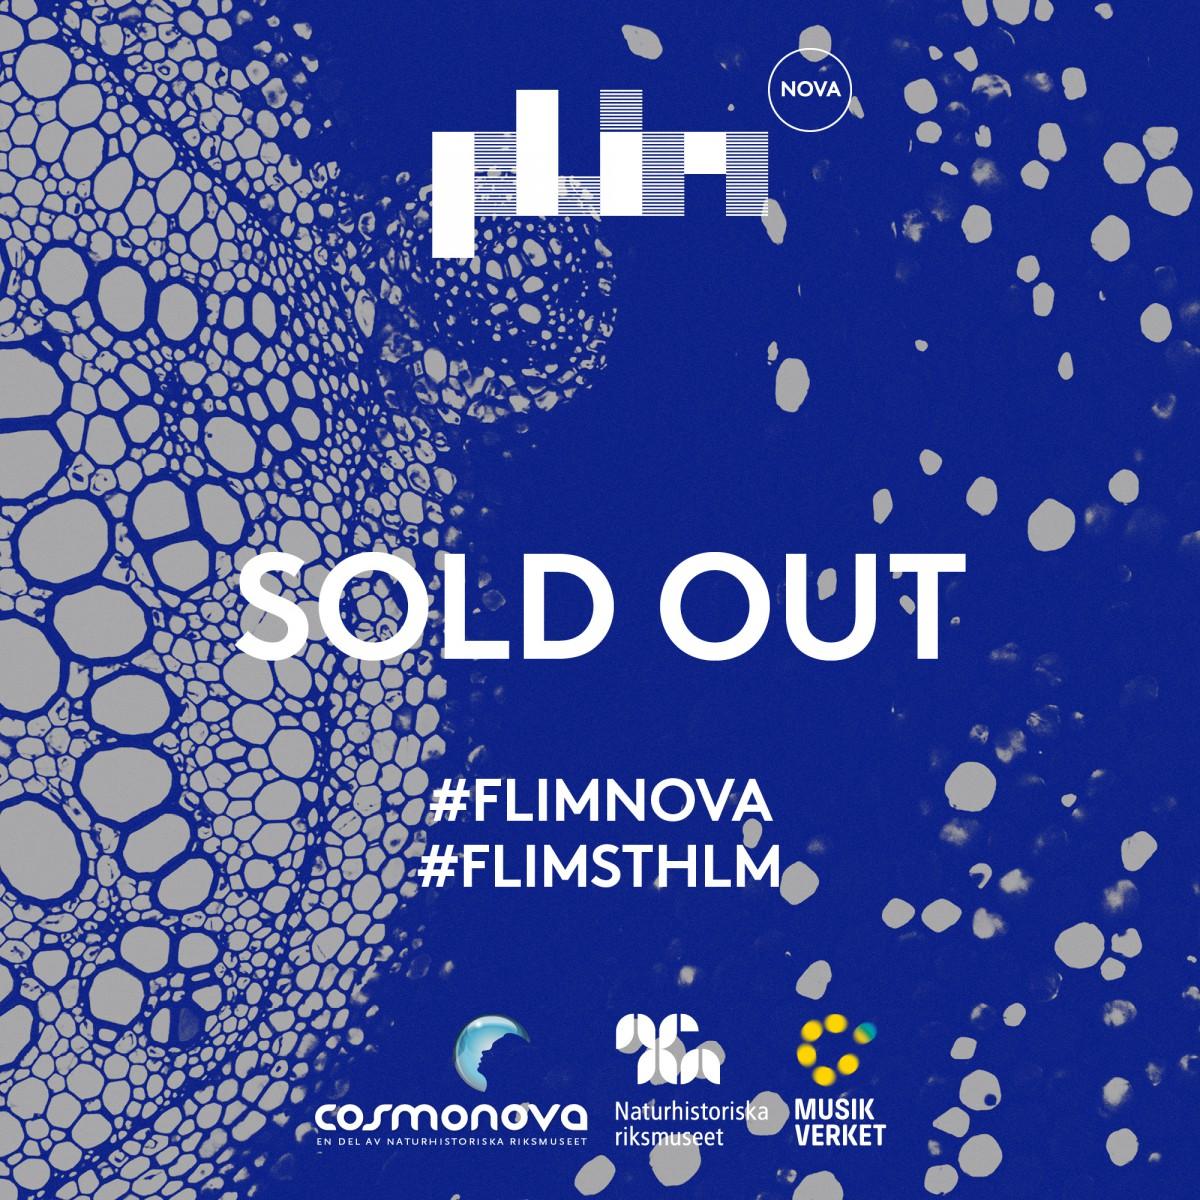 FLIM_NOVA_aug2015_IG_2000x2000_soldout2